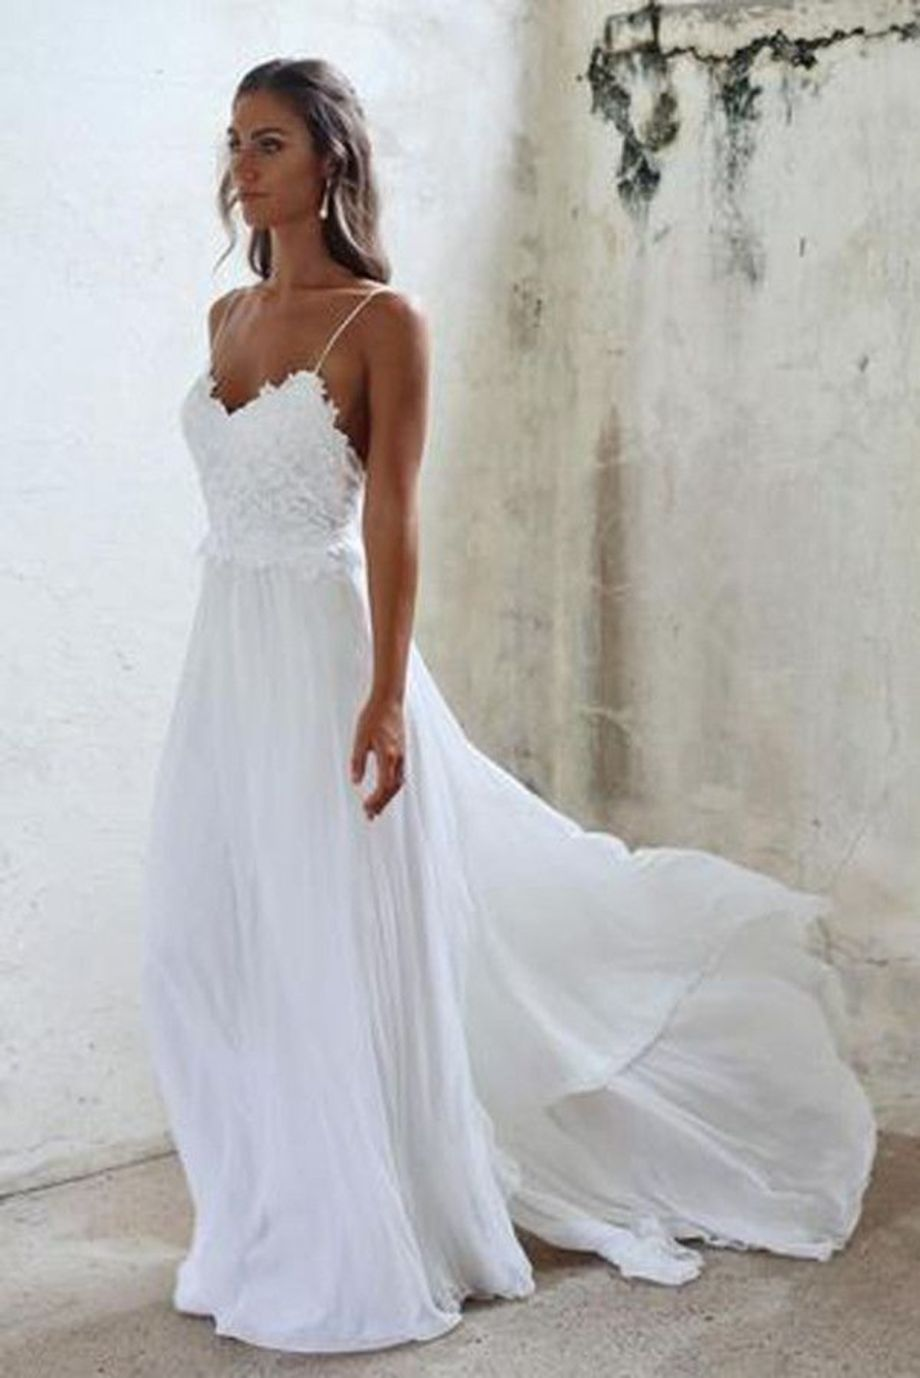 60 Beautiful and Adorable Summer Wedding Dresses Ideas | Summer ...